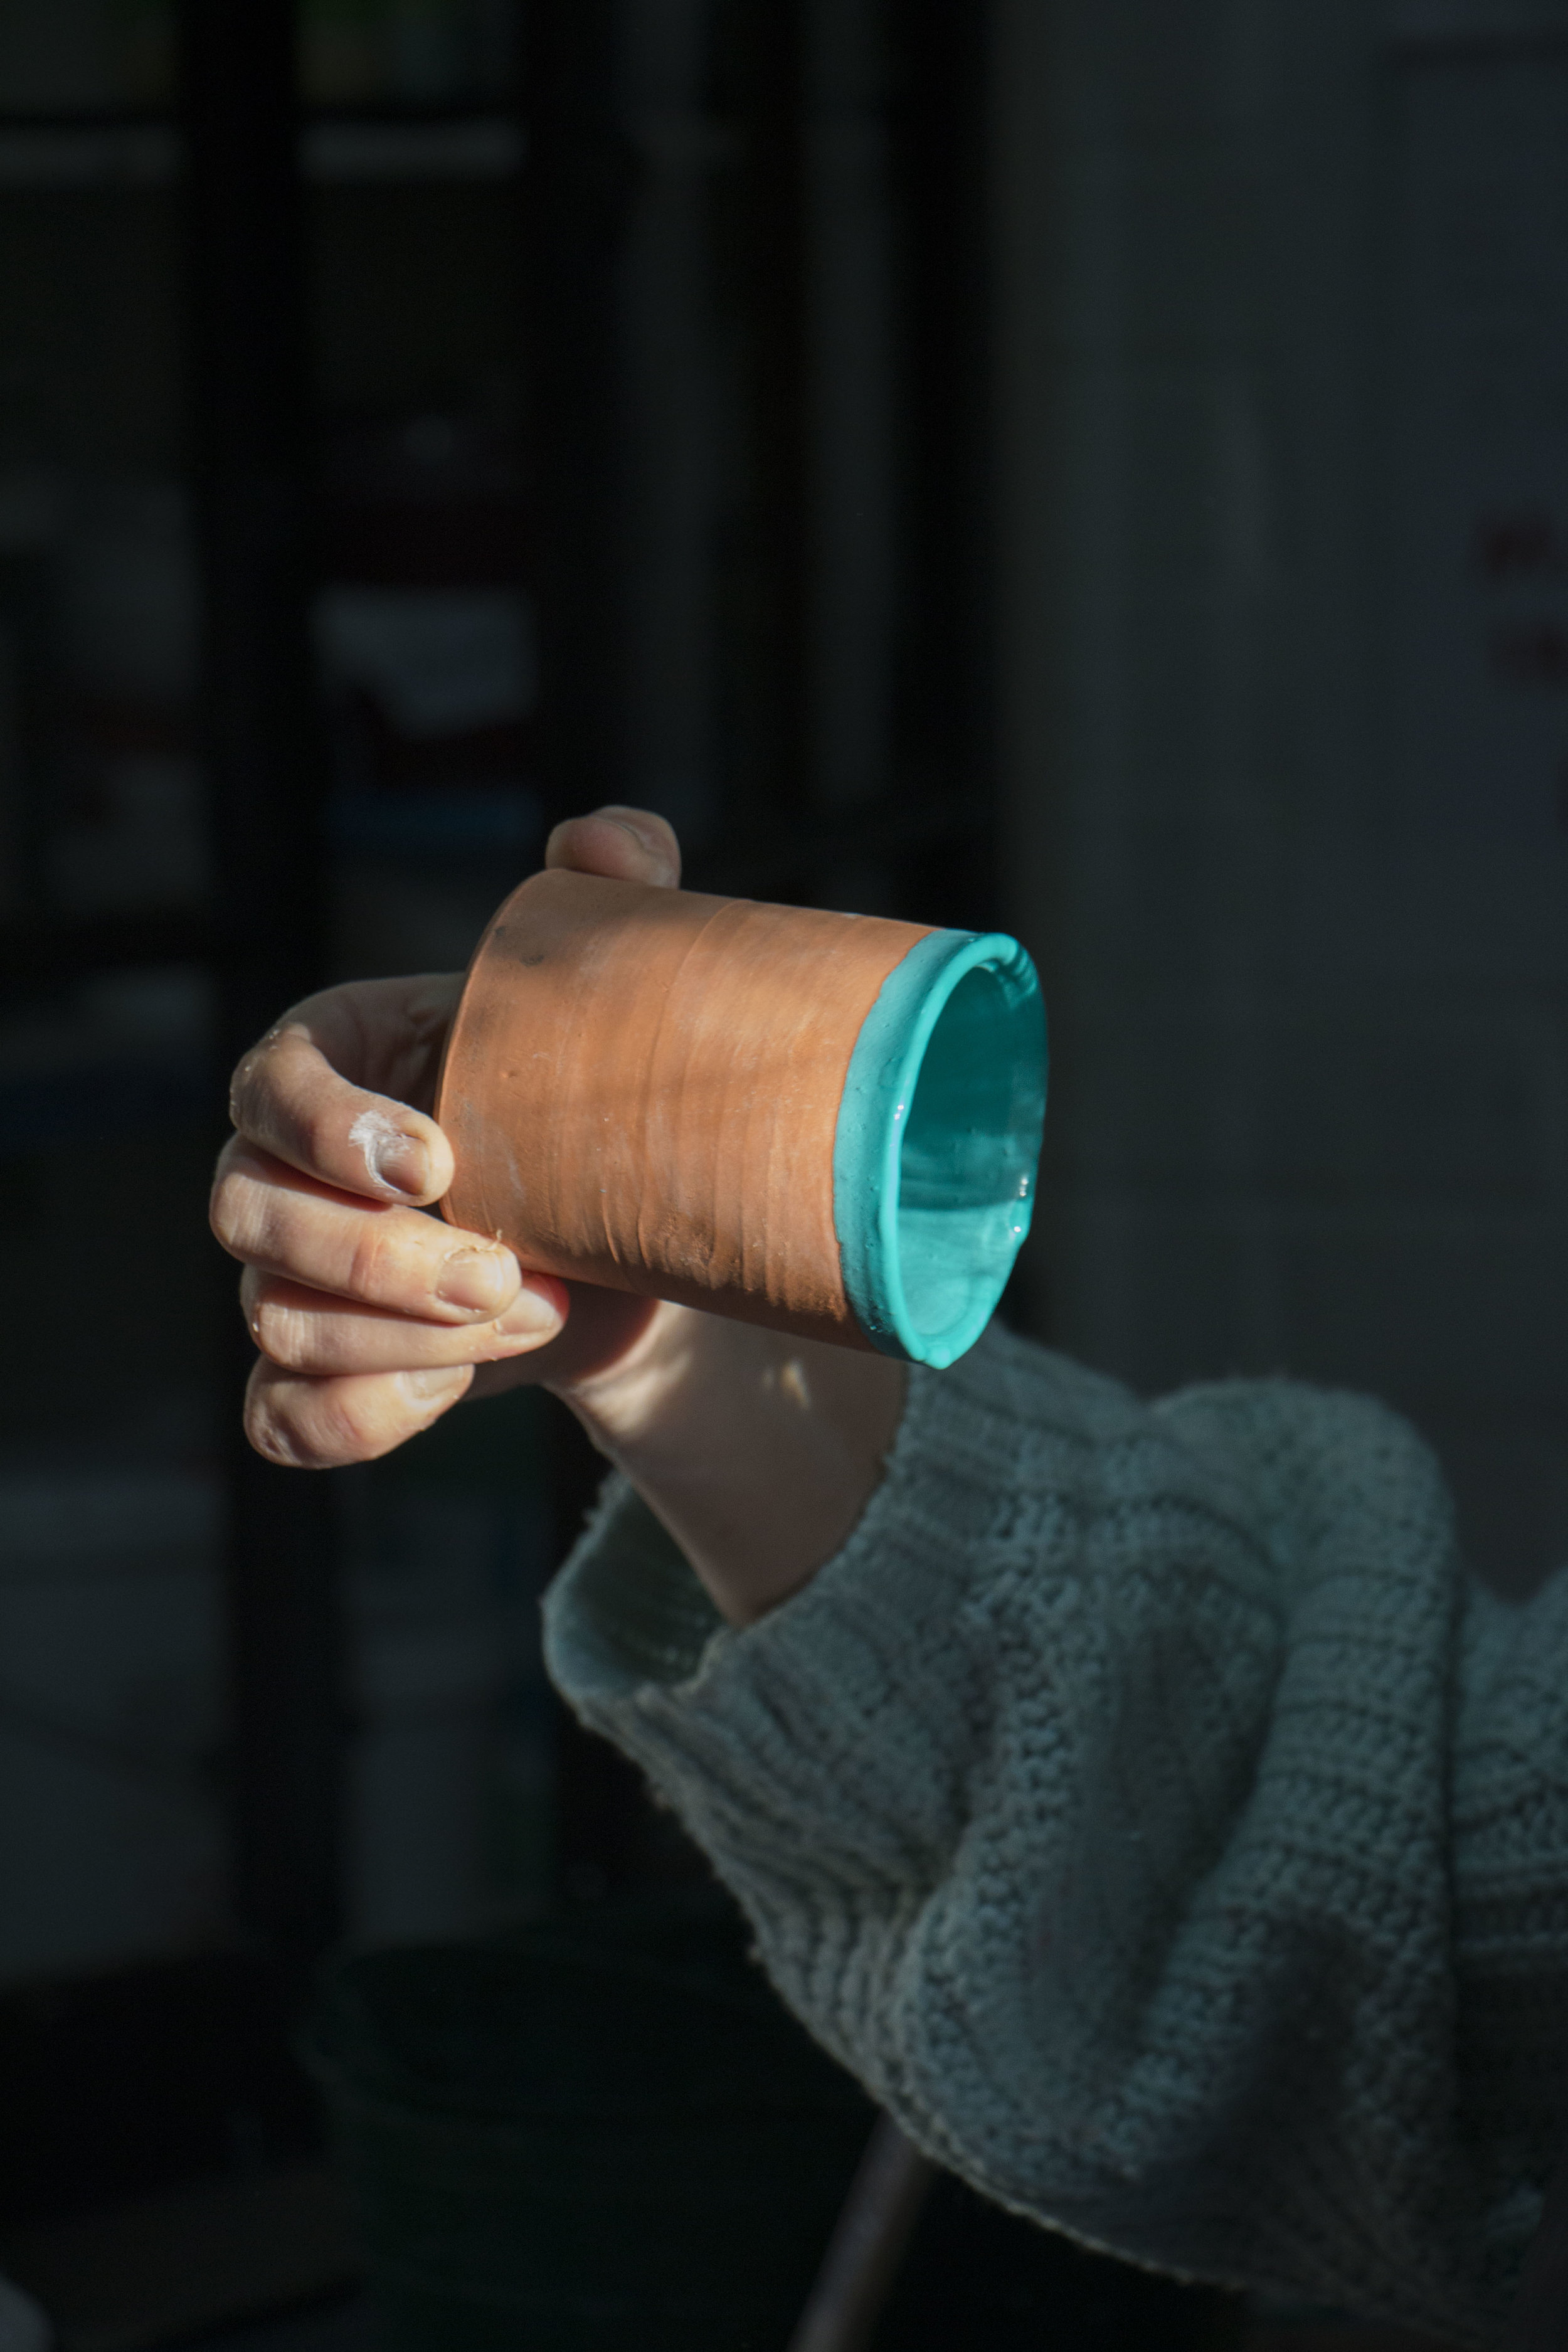 fra-cups-collaboration_11.jpg